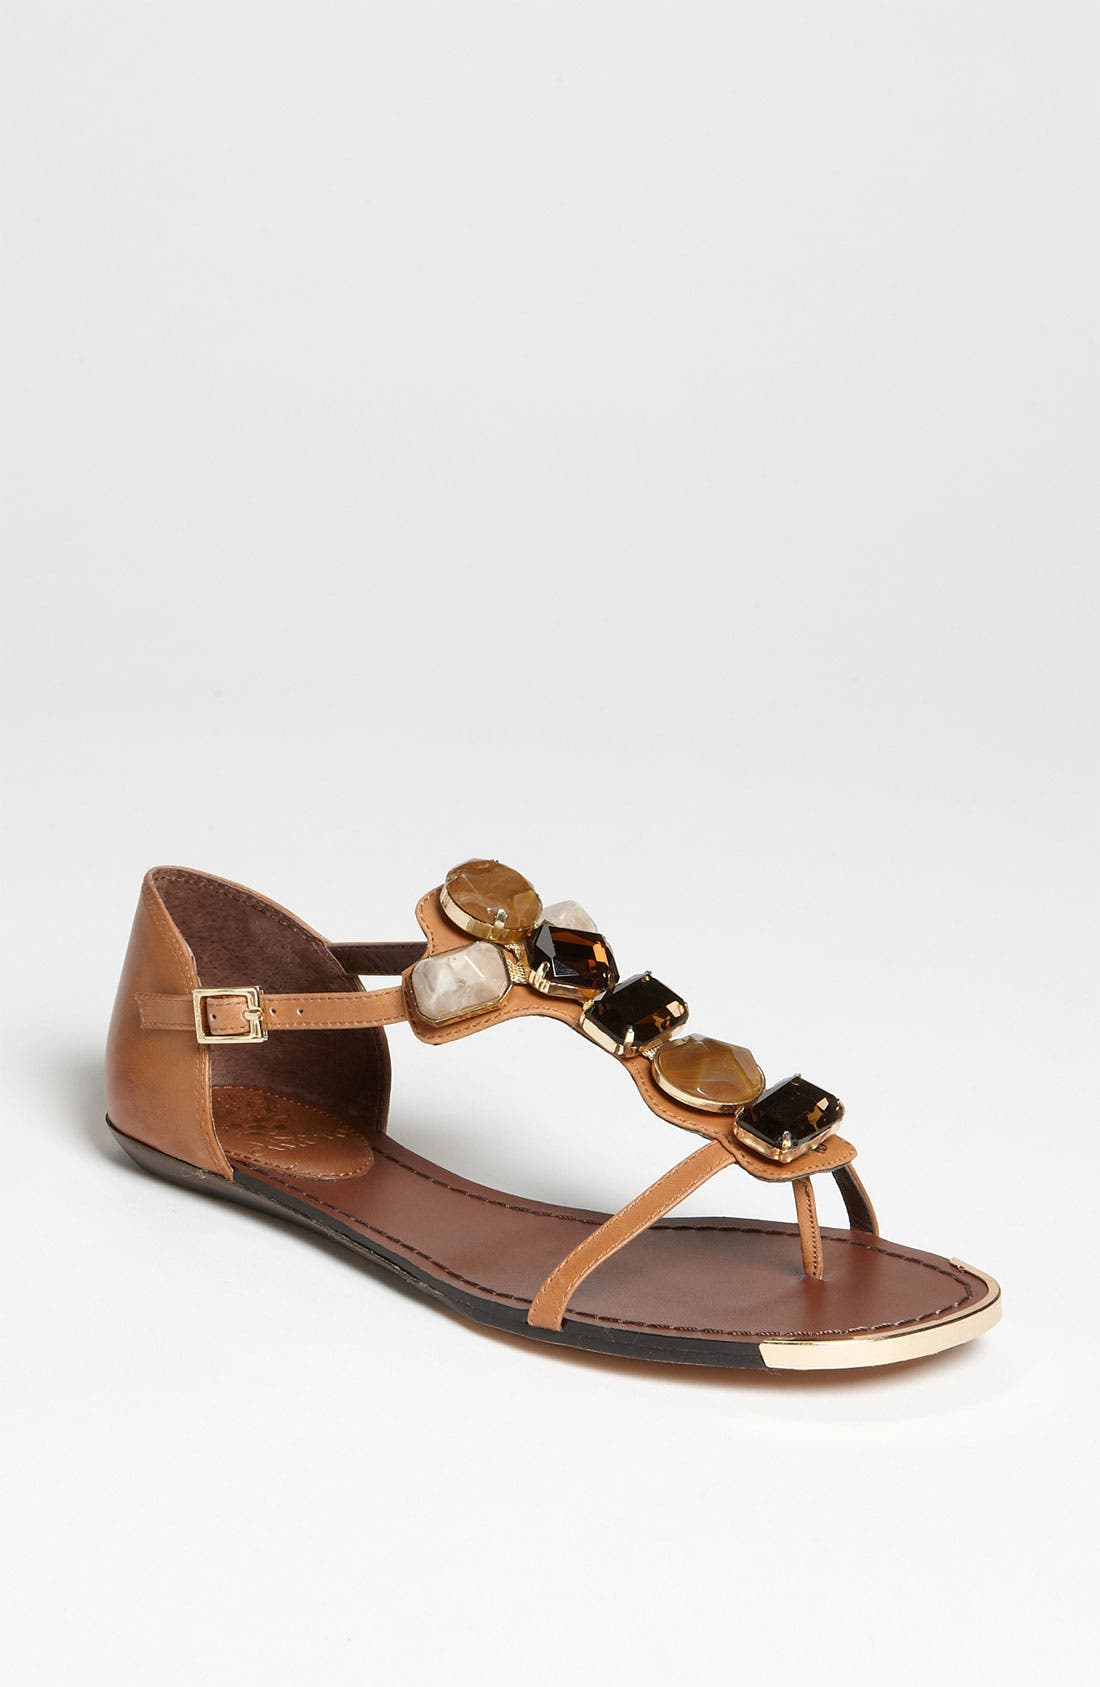 Main Image - Vince Camuto 'Kaila' Sandal